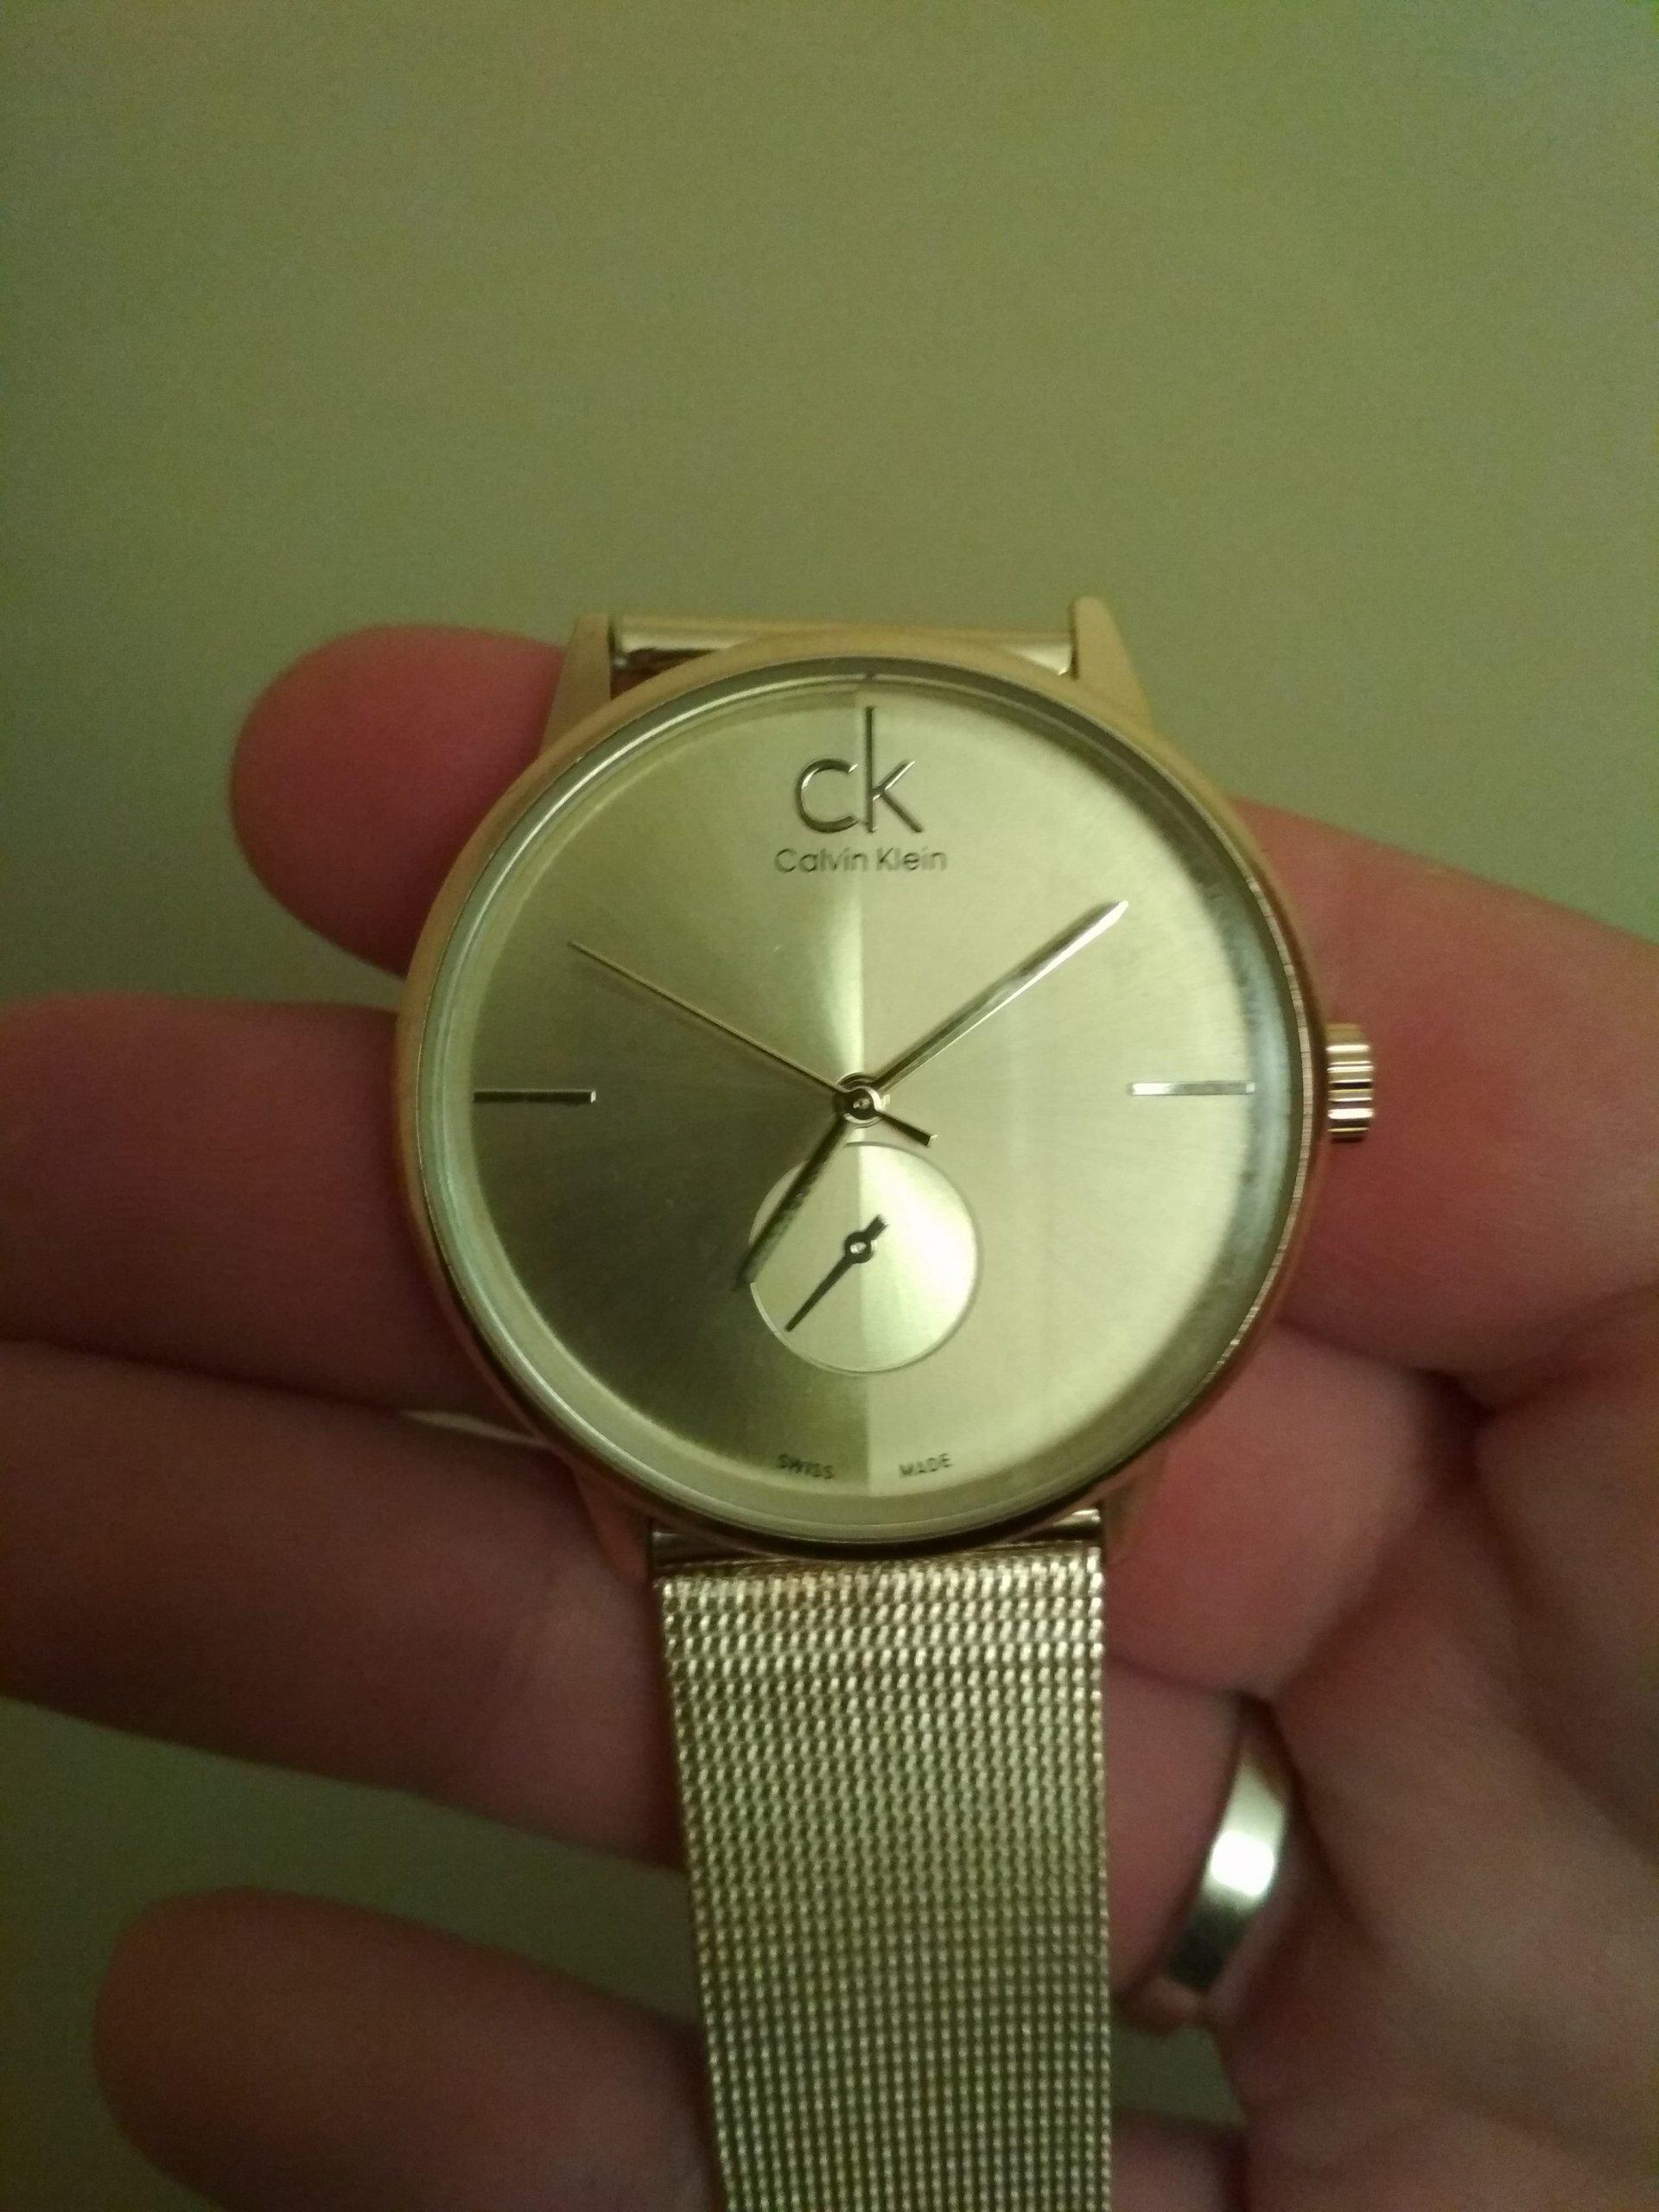 614137bfe029d Zegarek damski Calvin Klein licytacja - 7349058541 - oficjalne ...